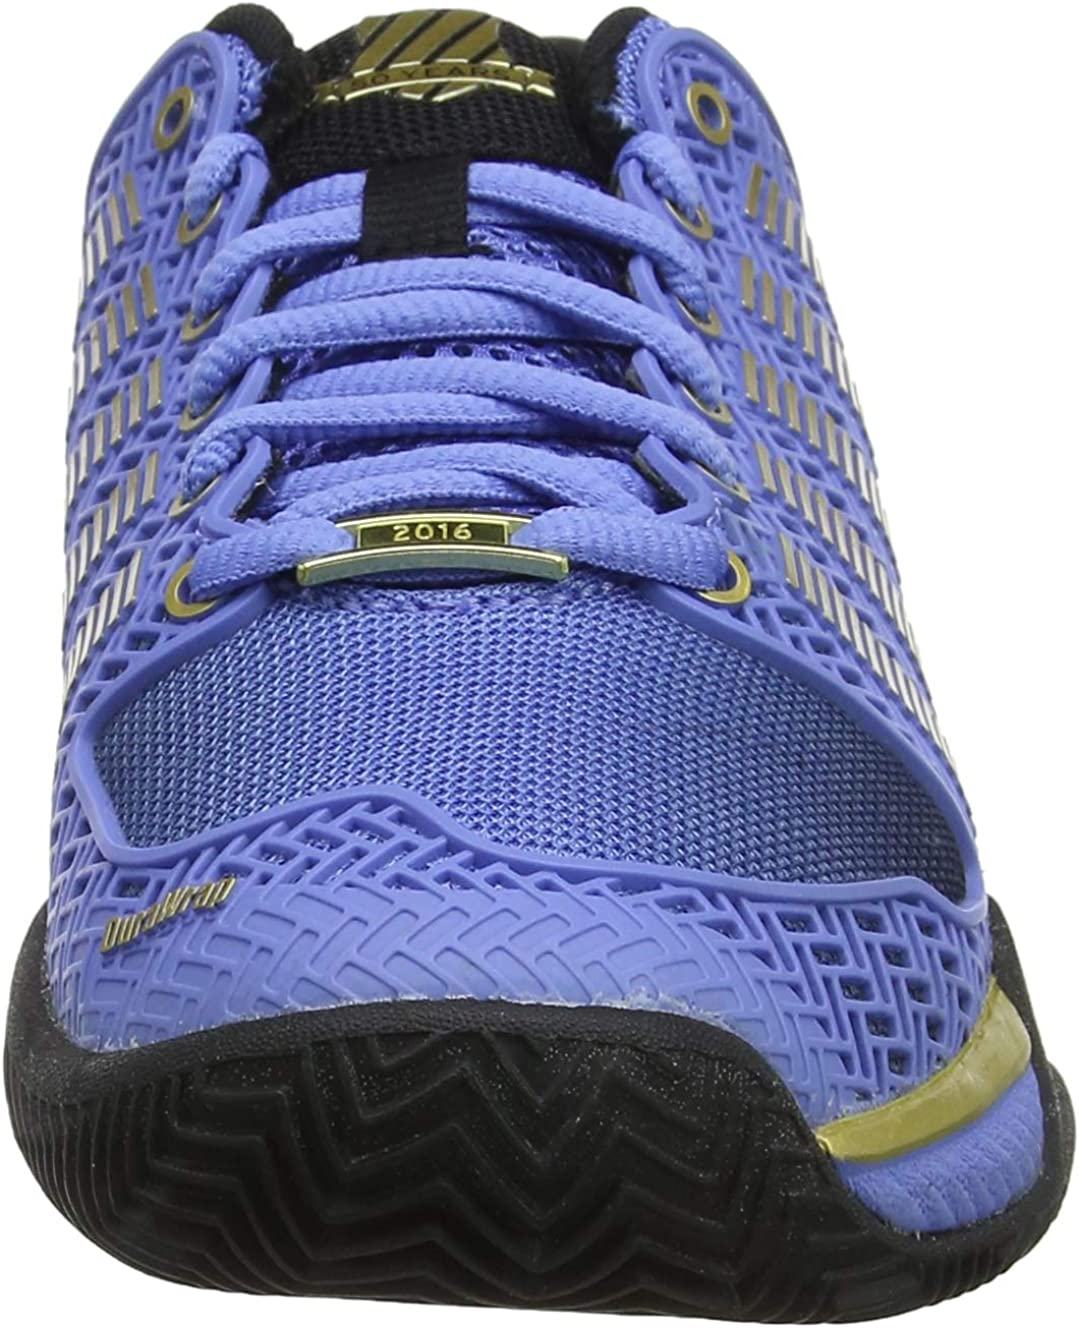 8 us K-Swiss Womens Tennis Shoes